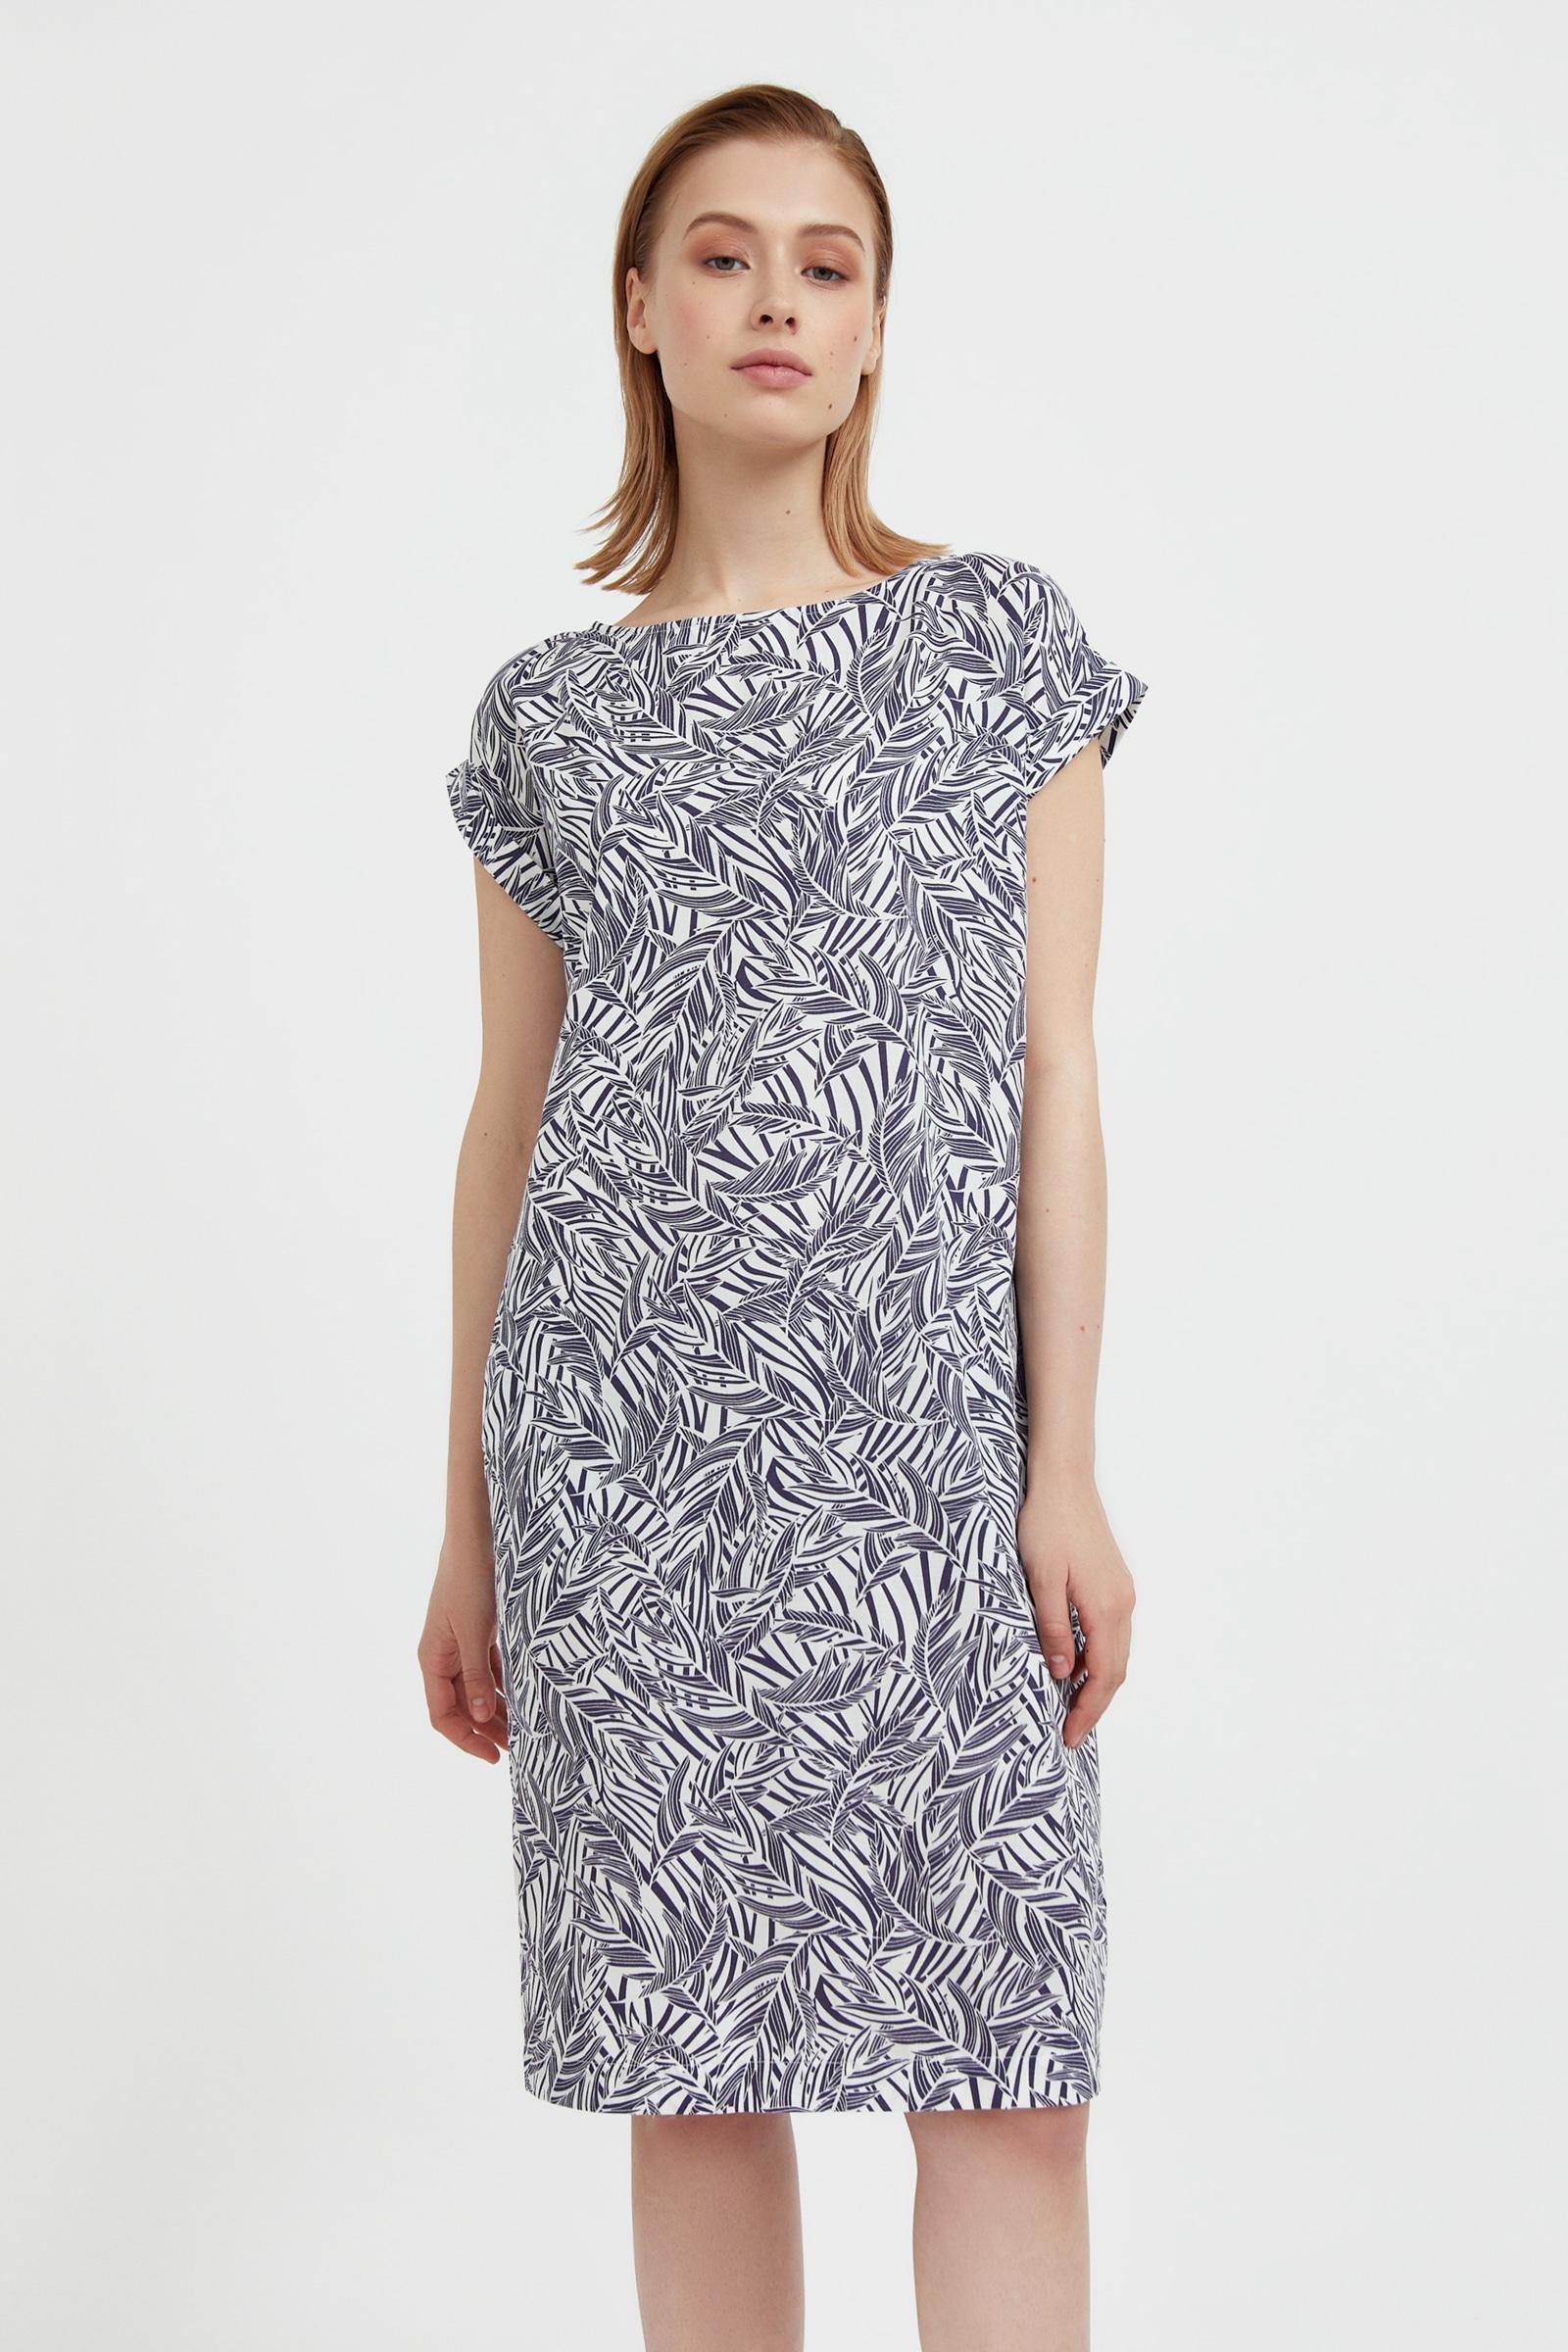 finn flare -  Jerseykleid, mit trendigem Alloverprint